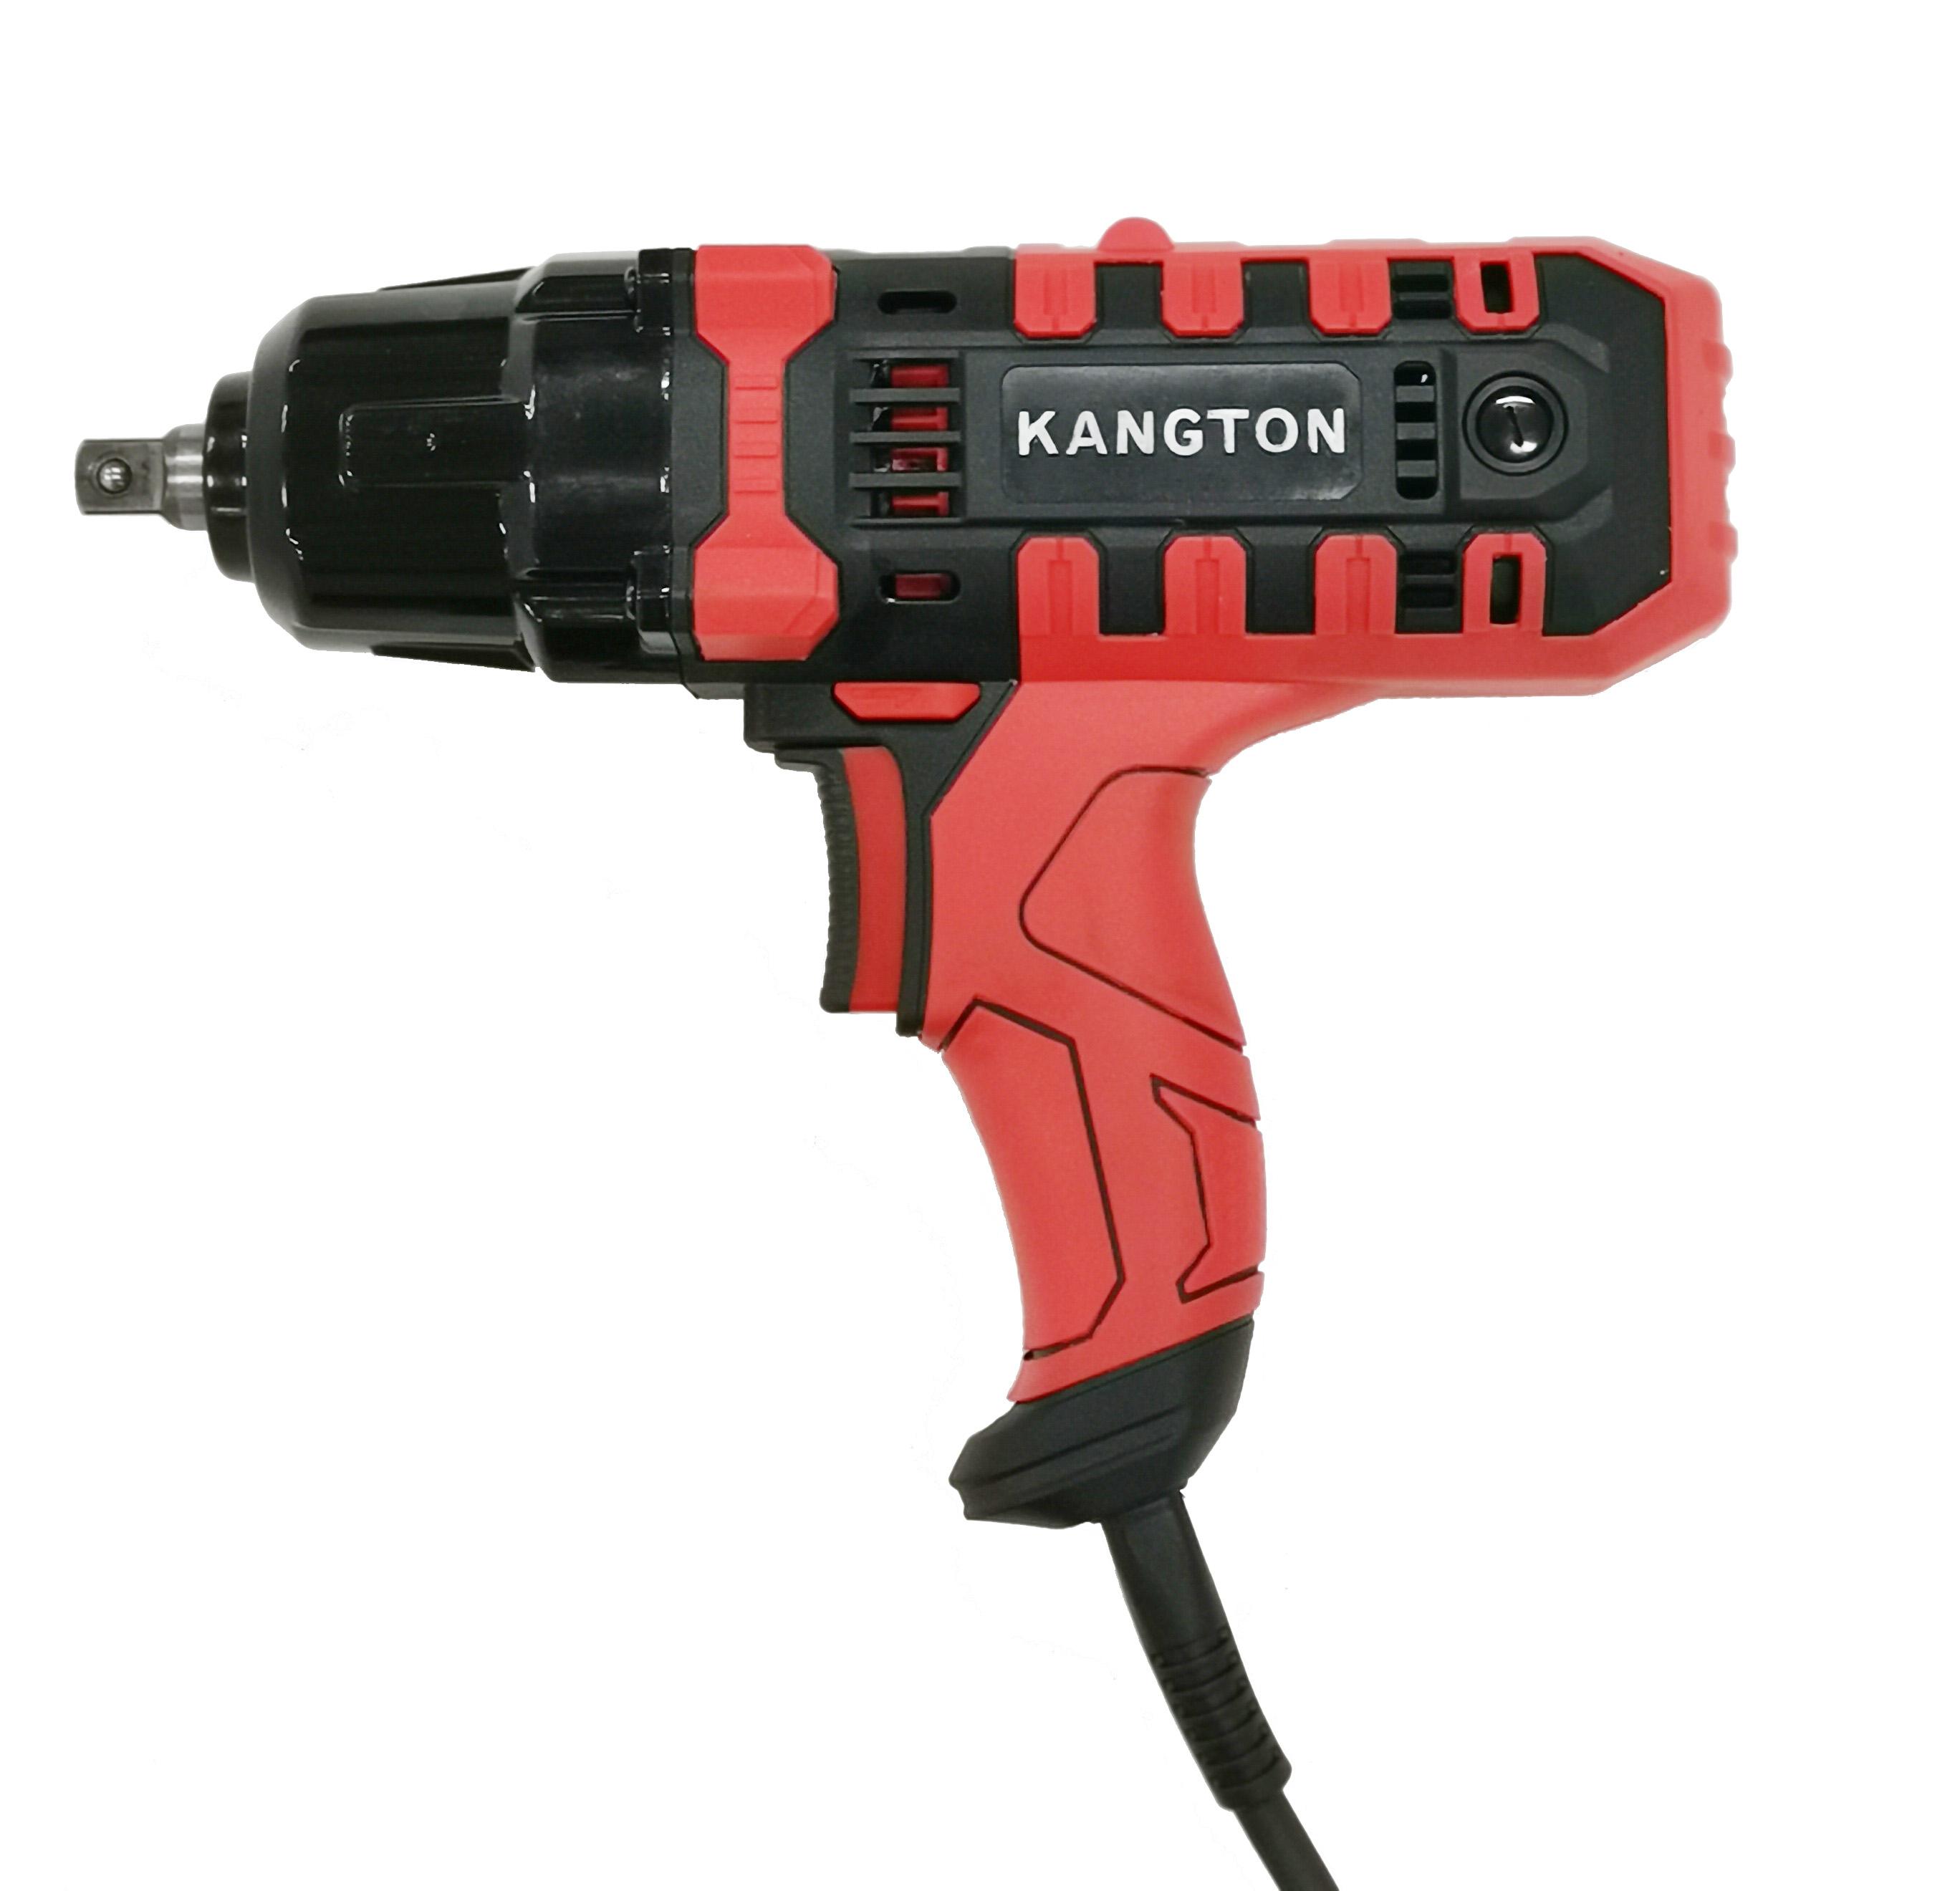 KT520-1